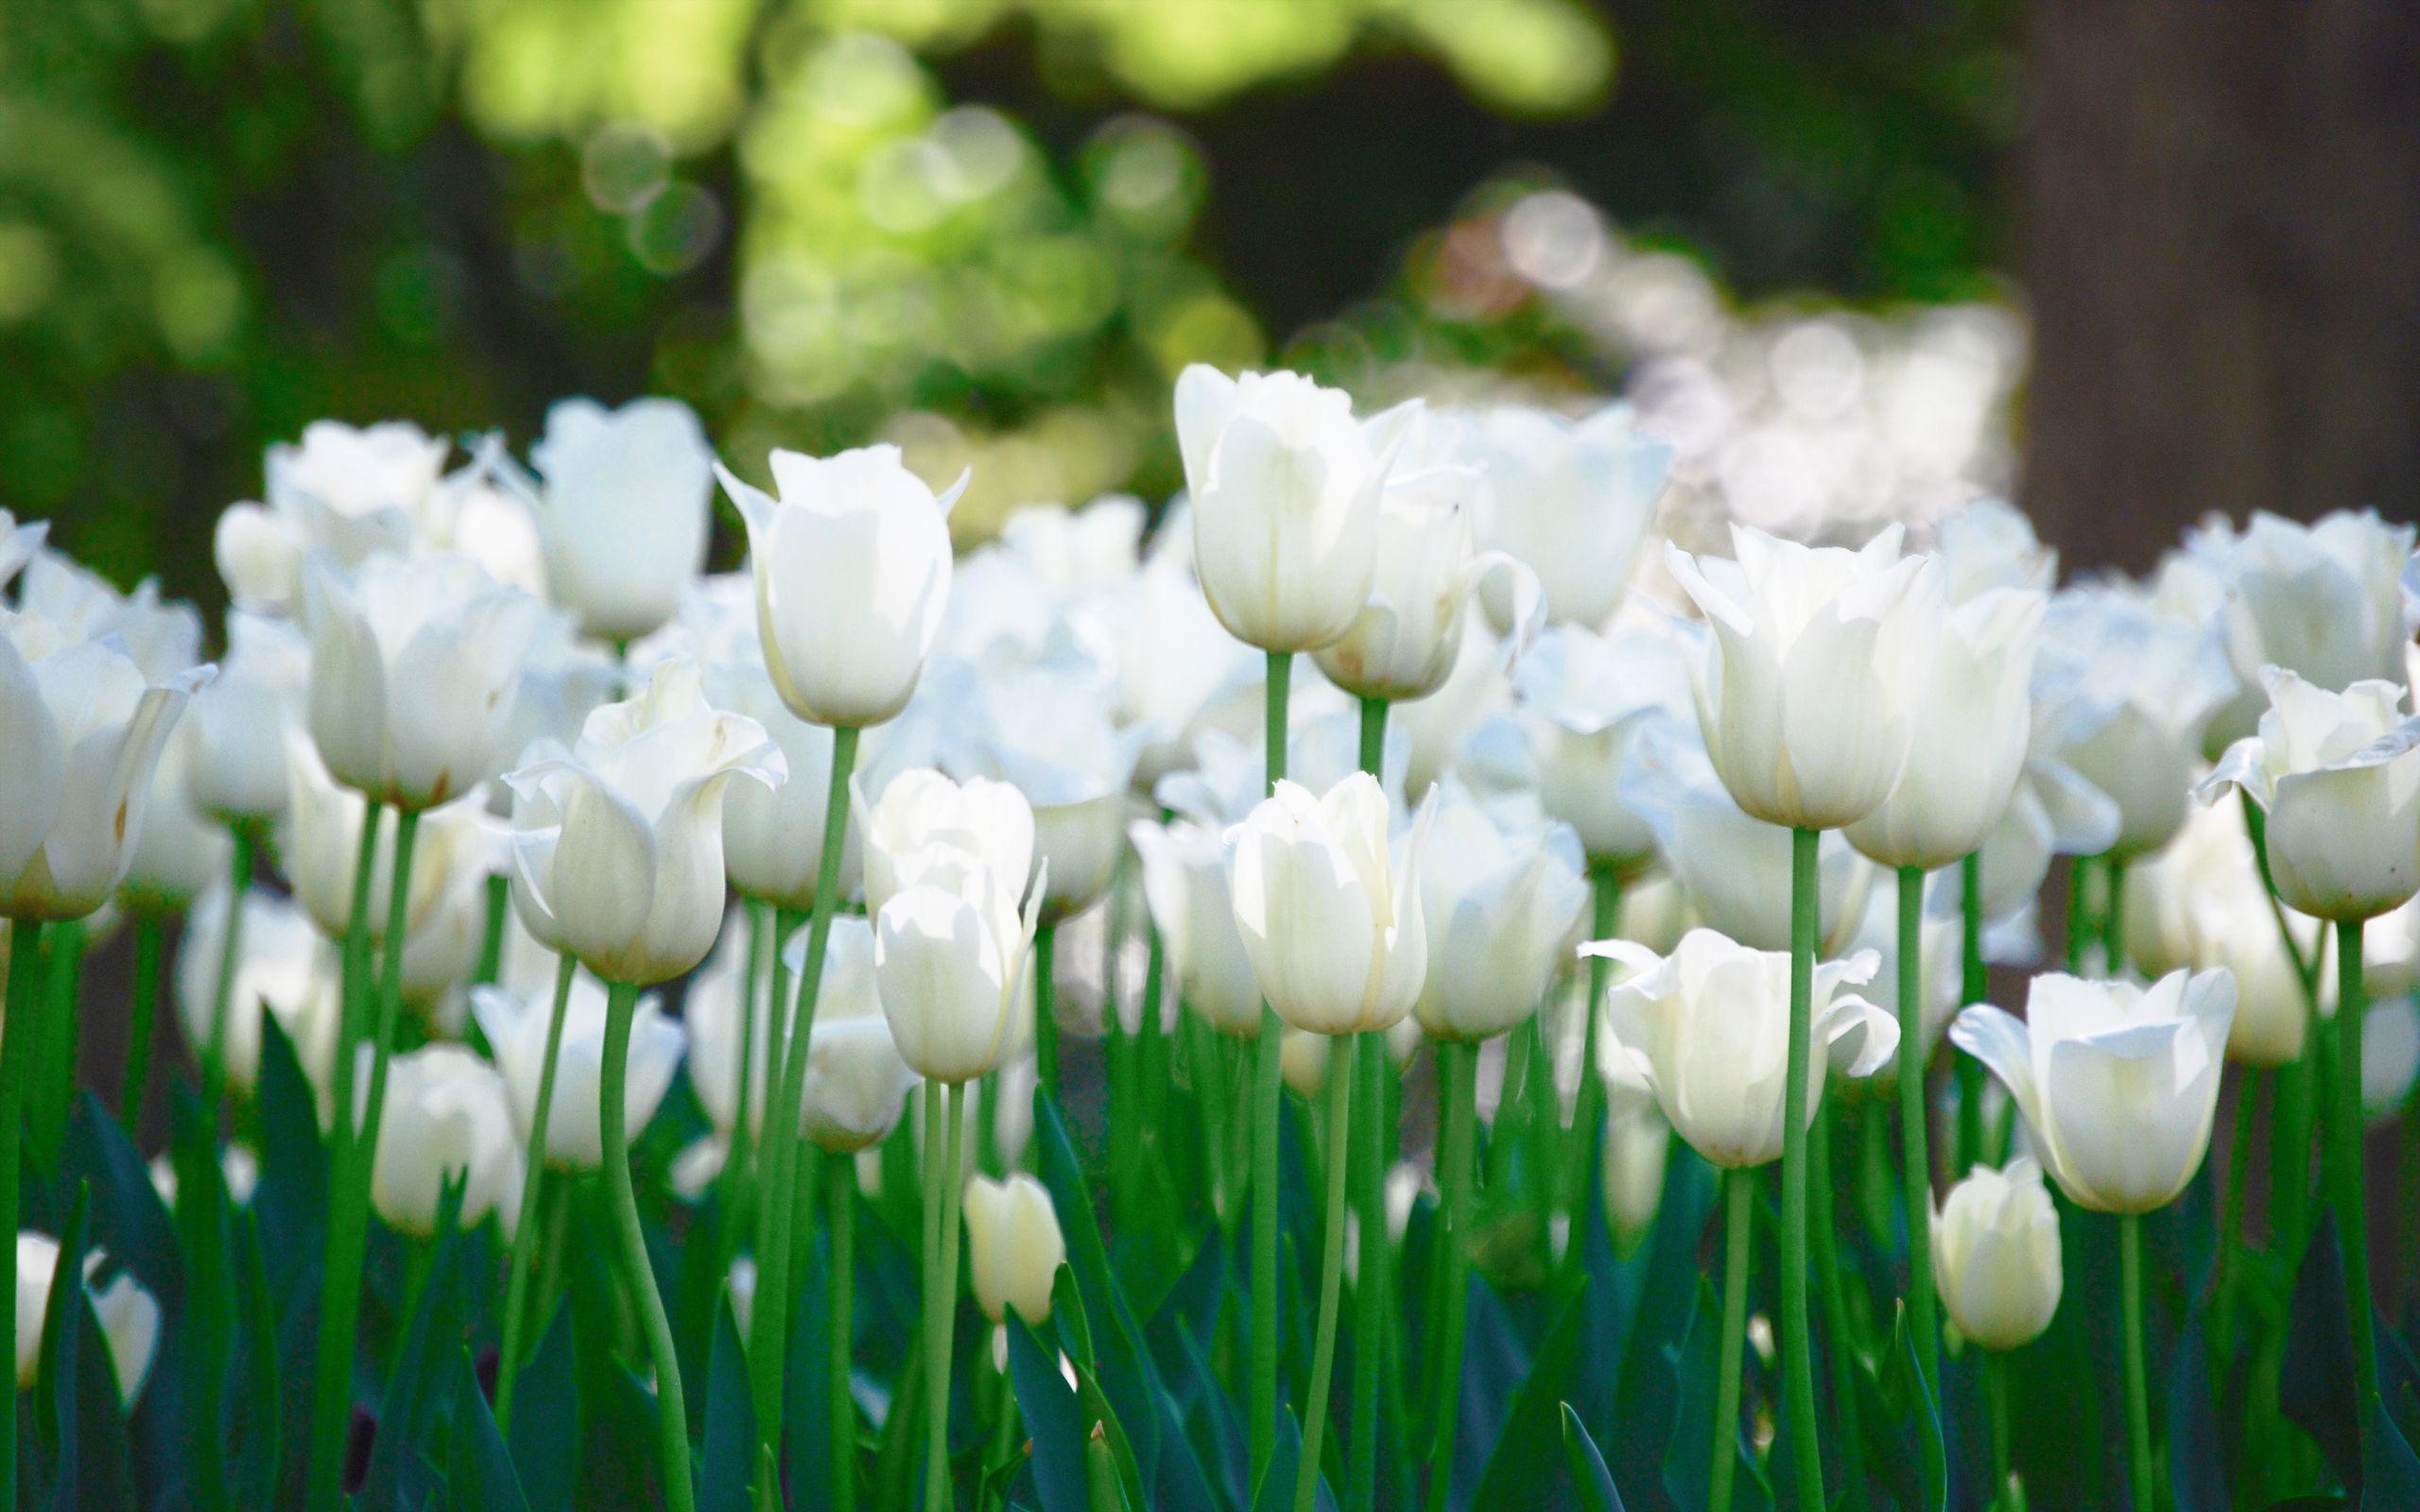 White Tulips 244665 Jpg 2560 1600 White Tulips Tulips Flowers White Flowers Garden